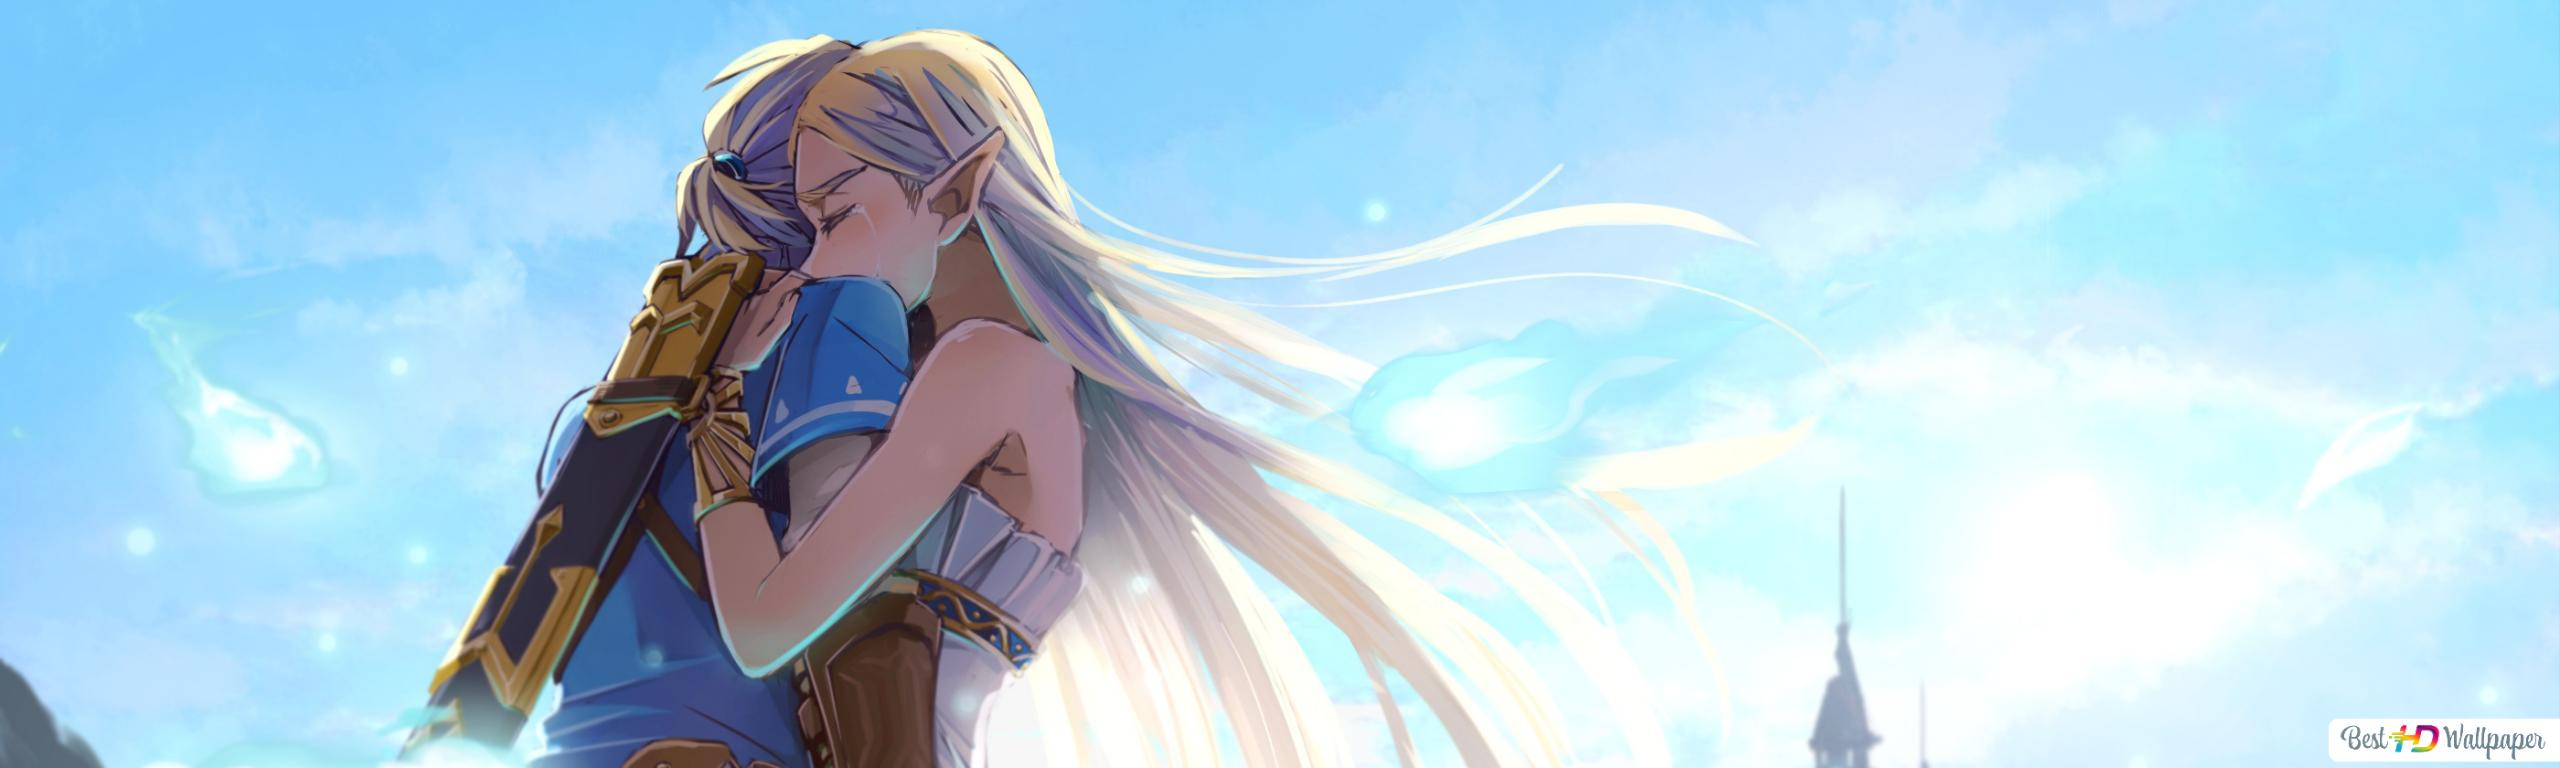 The Legend Of Zelda Breath Of The Wild Romantic Love Hd